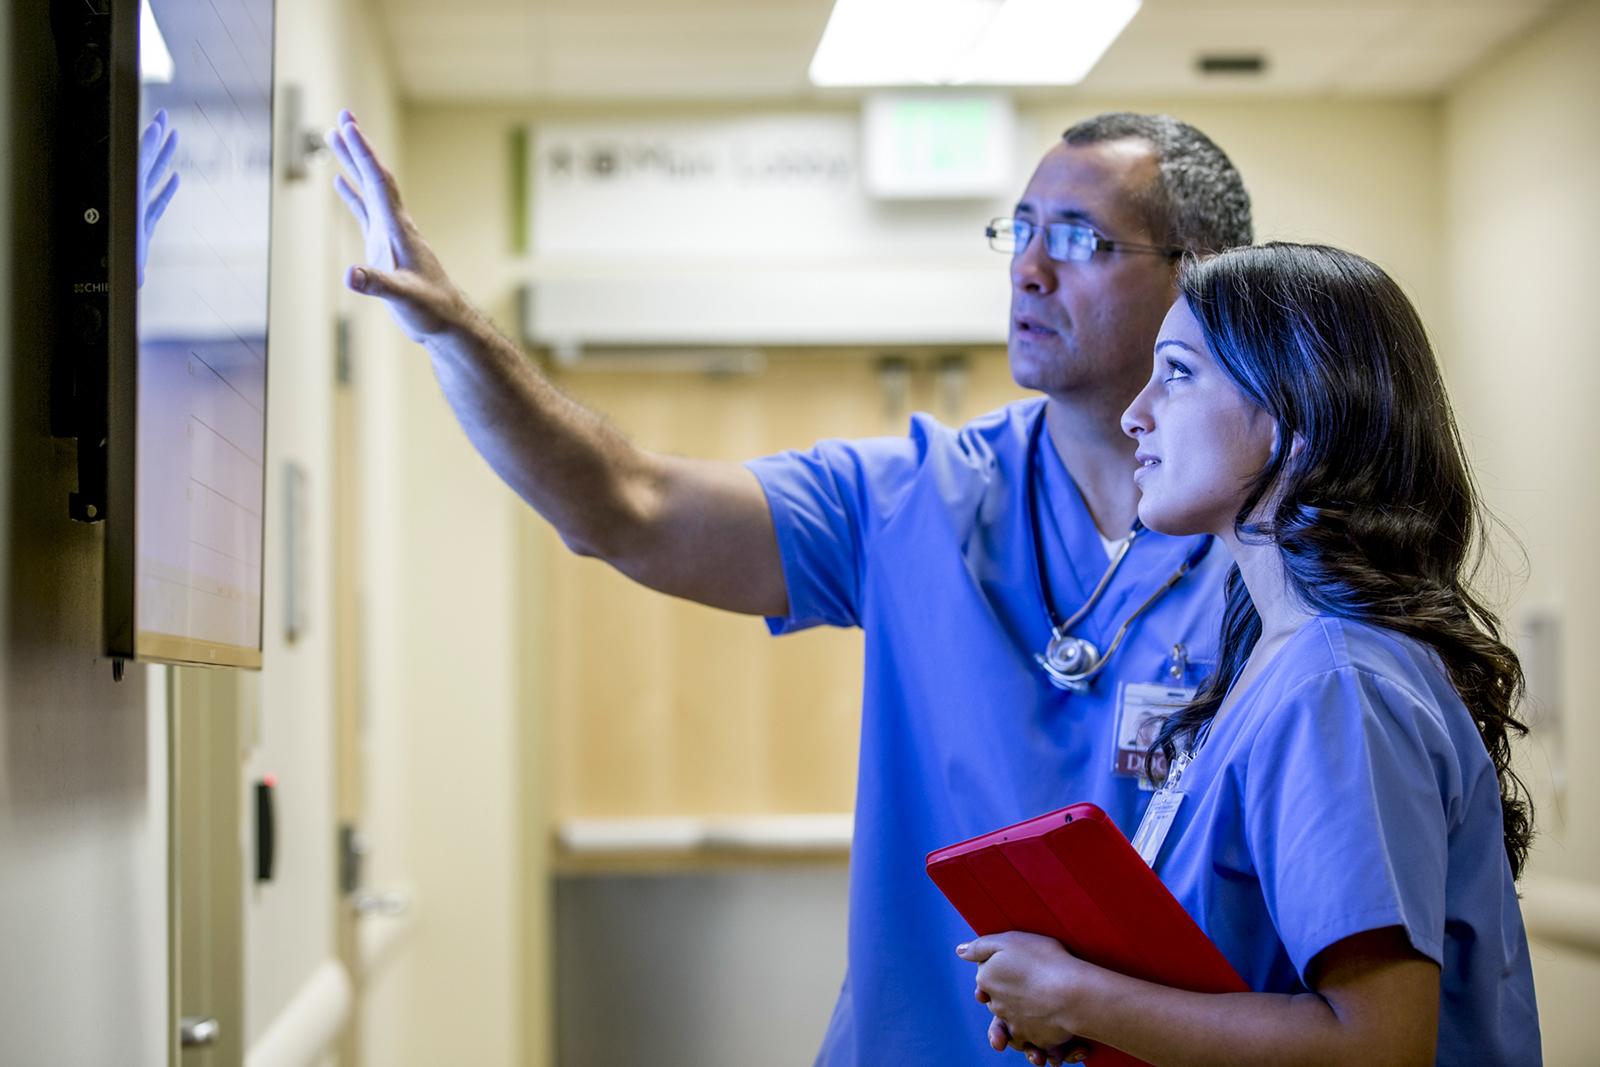 Mixed race medical doctors study charts hallway